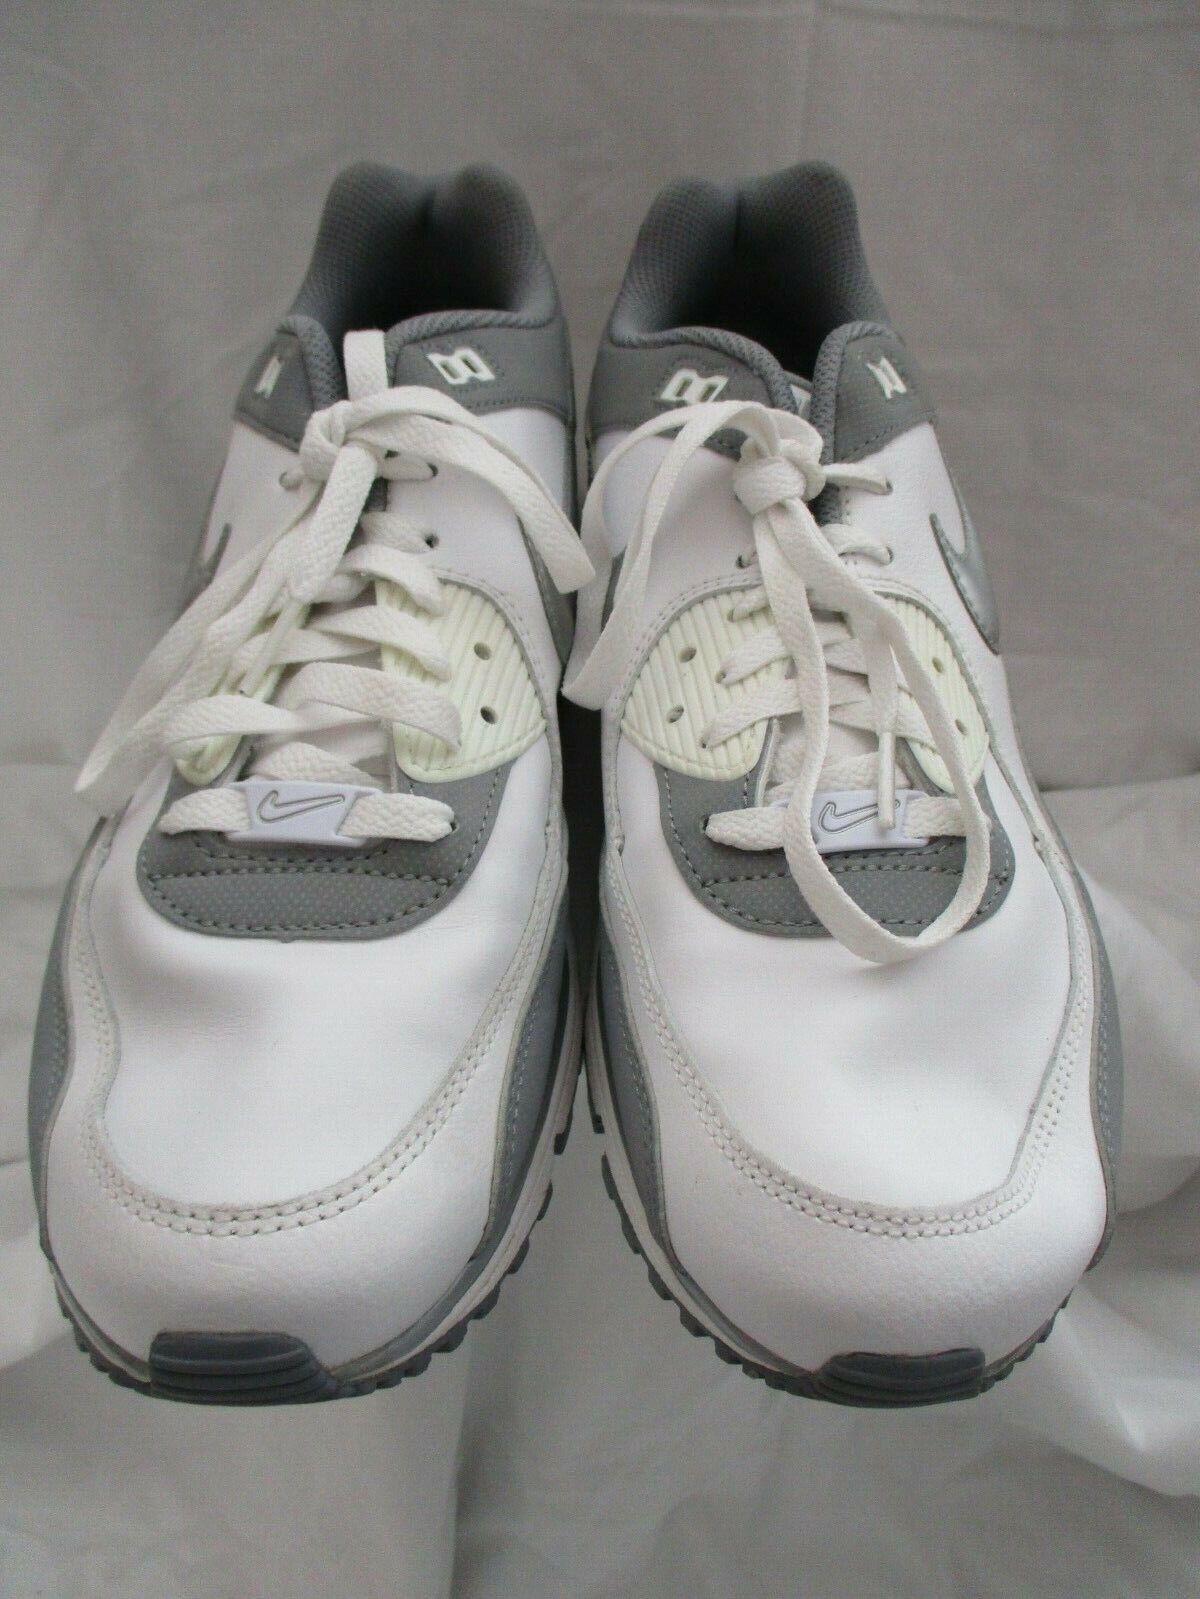 Nike - Air Max Wright 317551-119  Grey White  (New w o Box)  Size 11.5